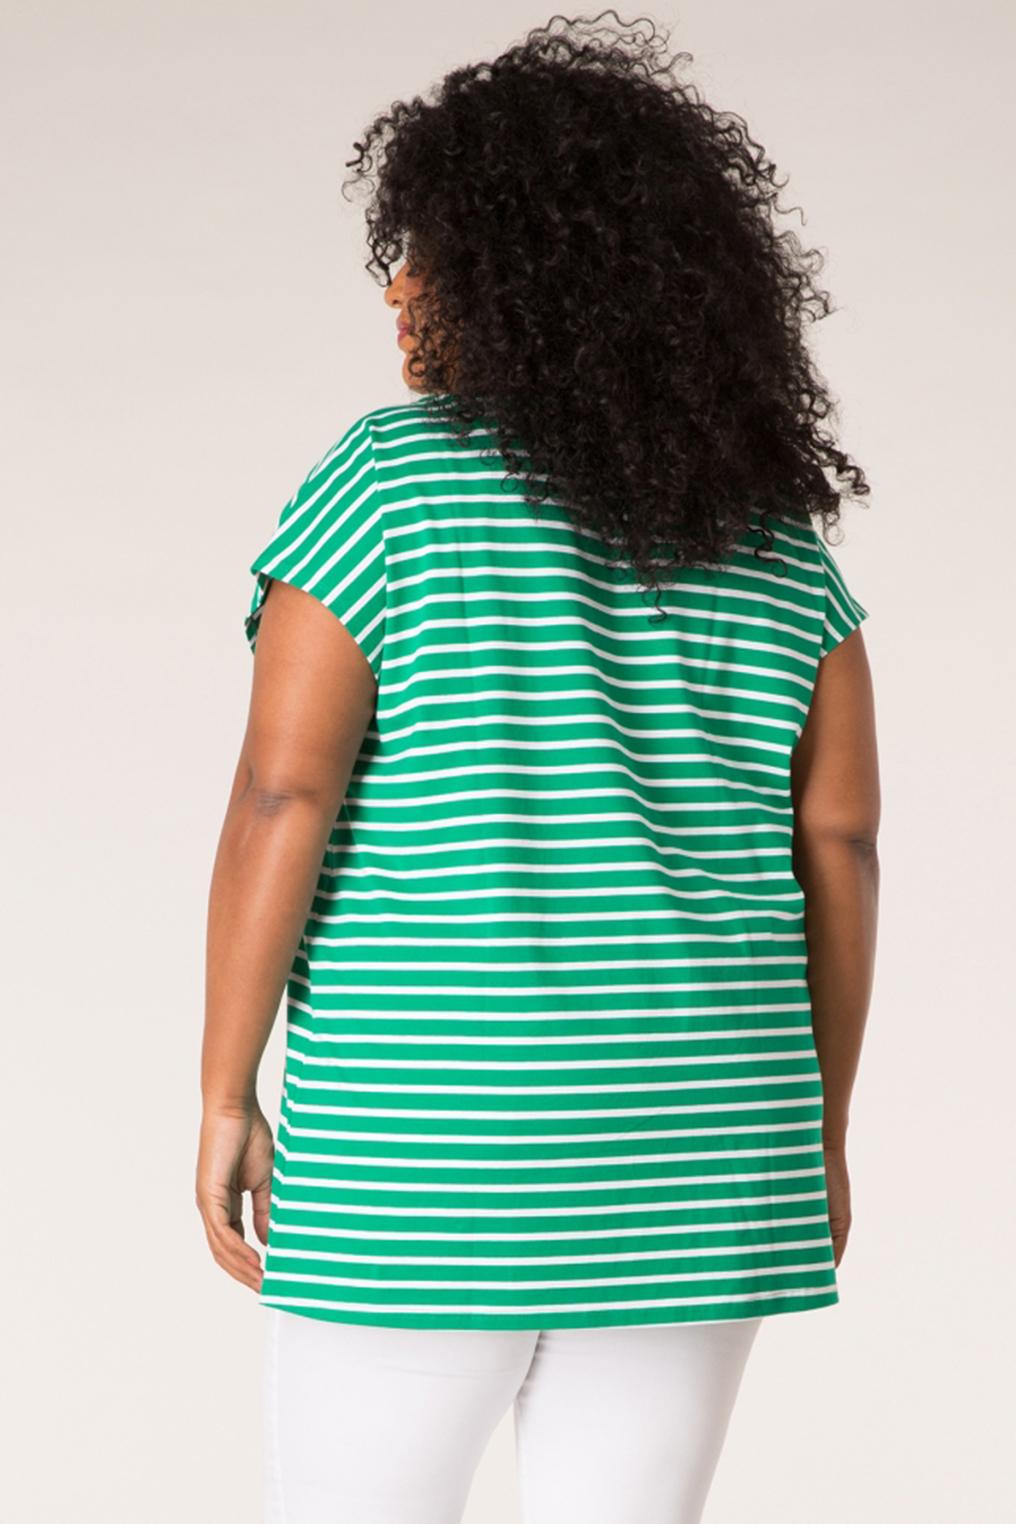 785aec5d52236c Shirt Ivy Bella streepjes print